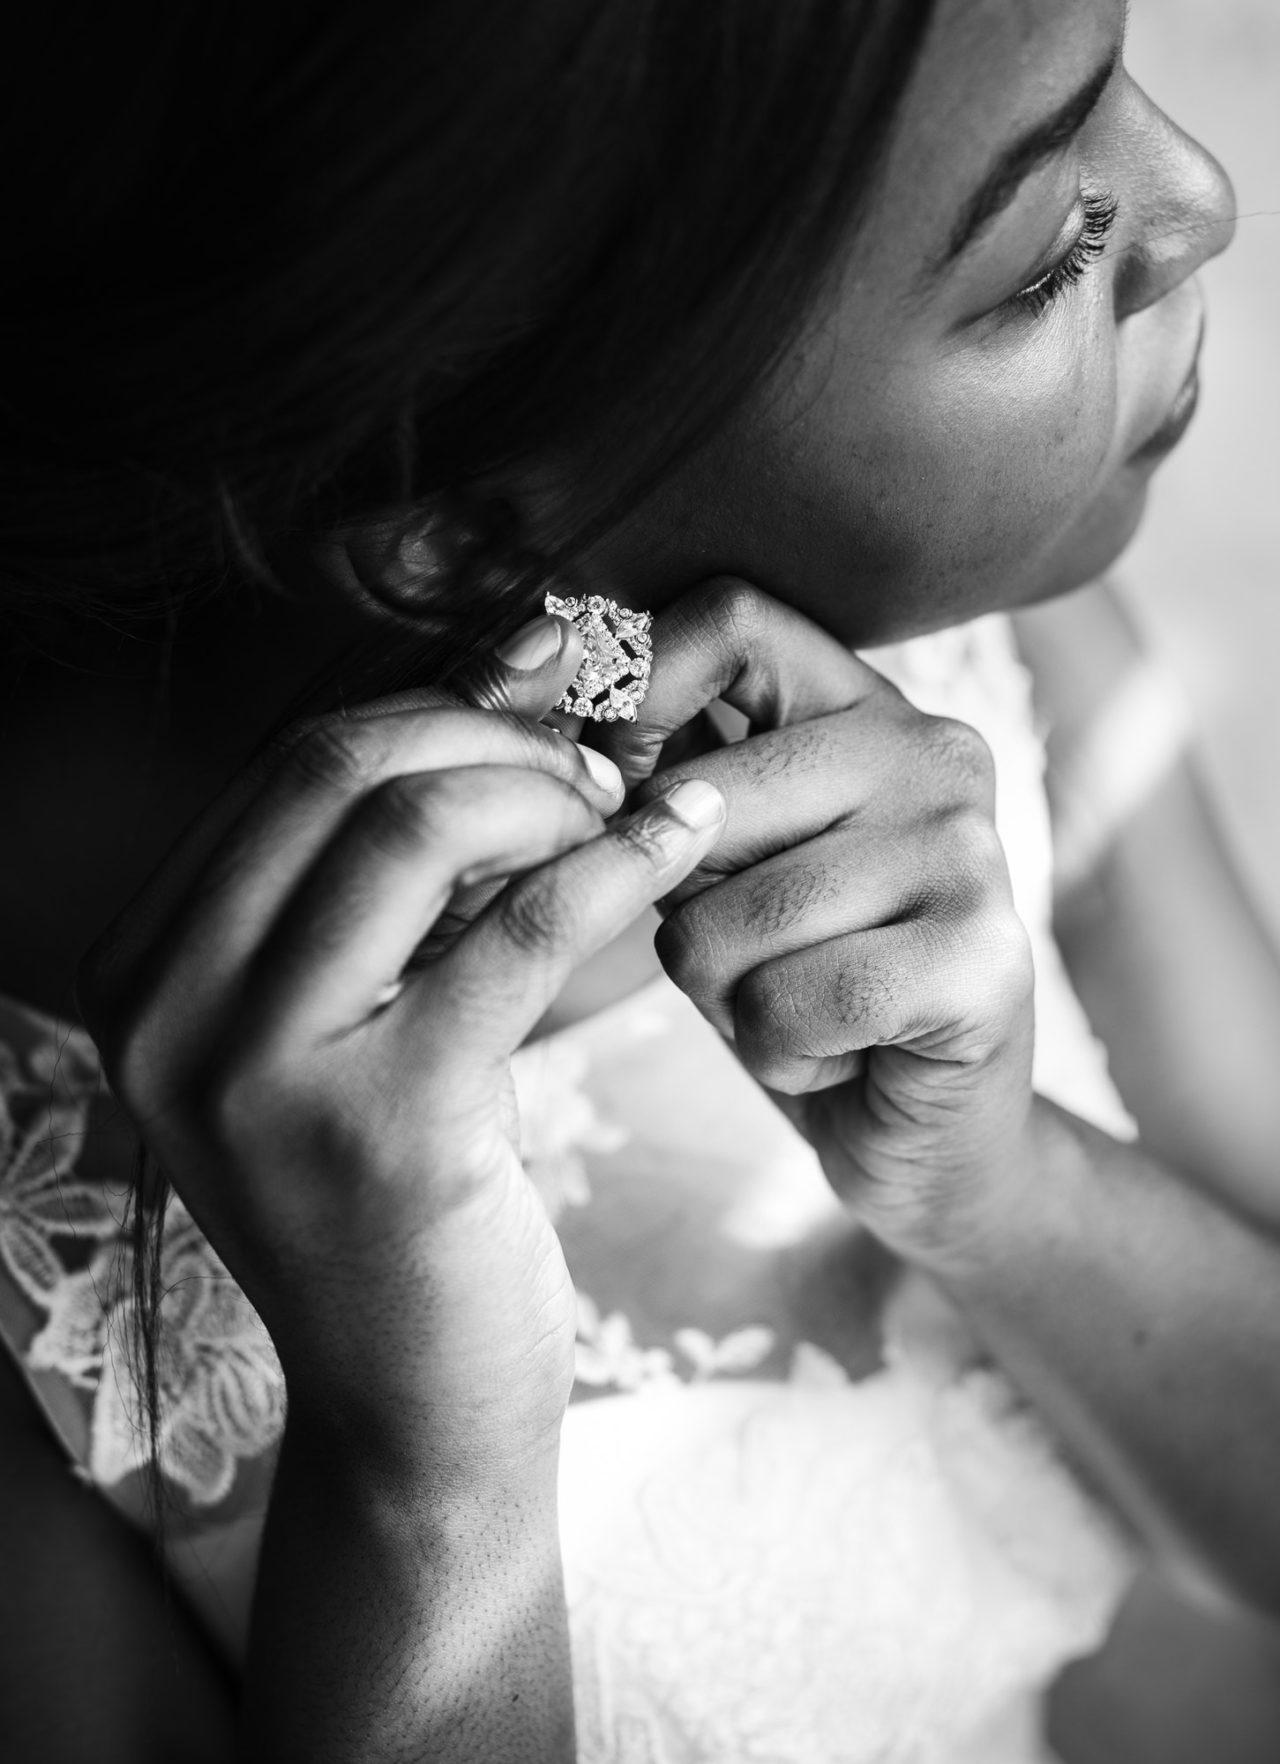 Bride Wearing Earing on Wedding Ceremony Preparation